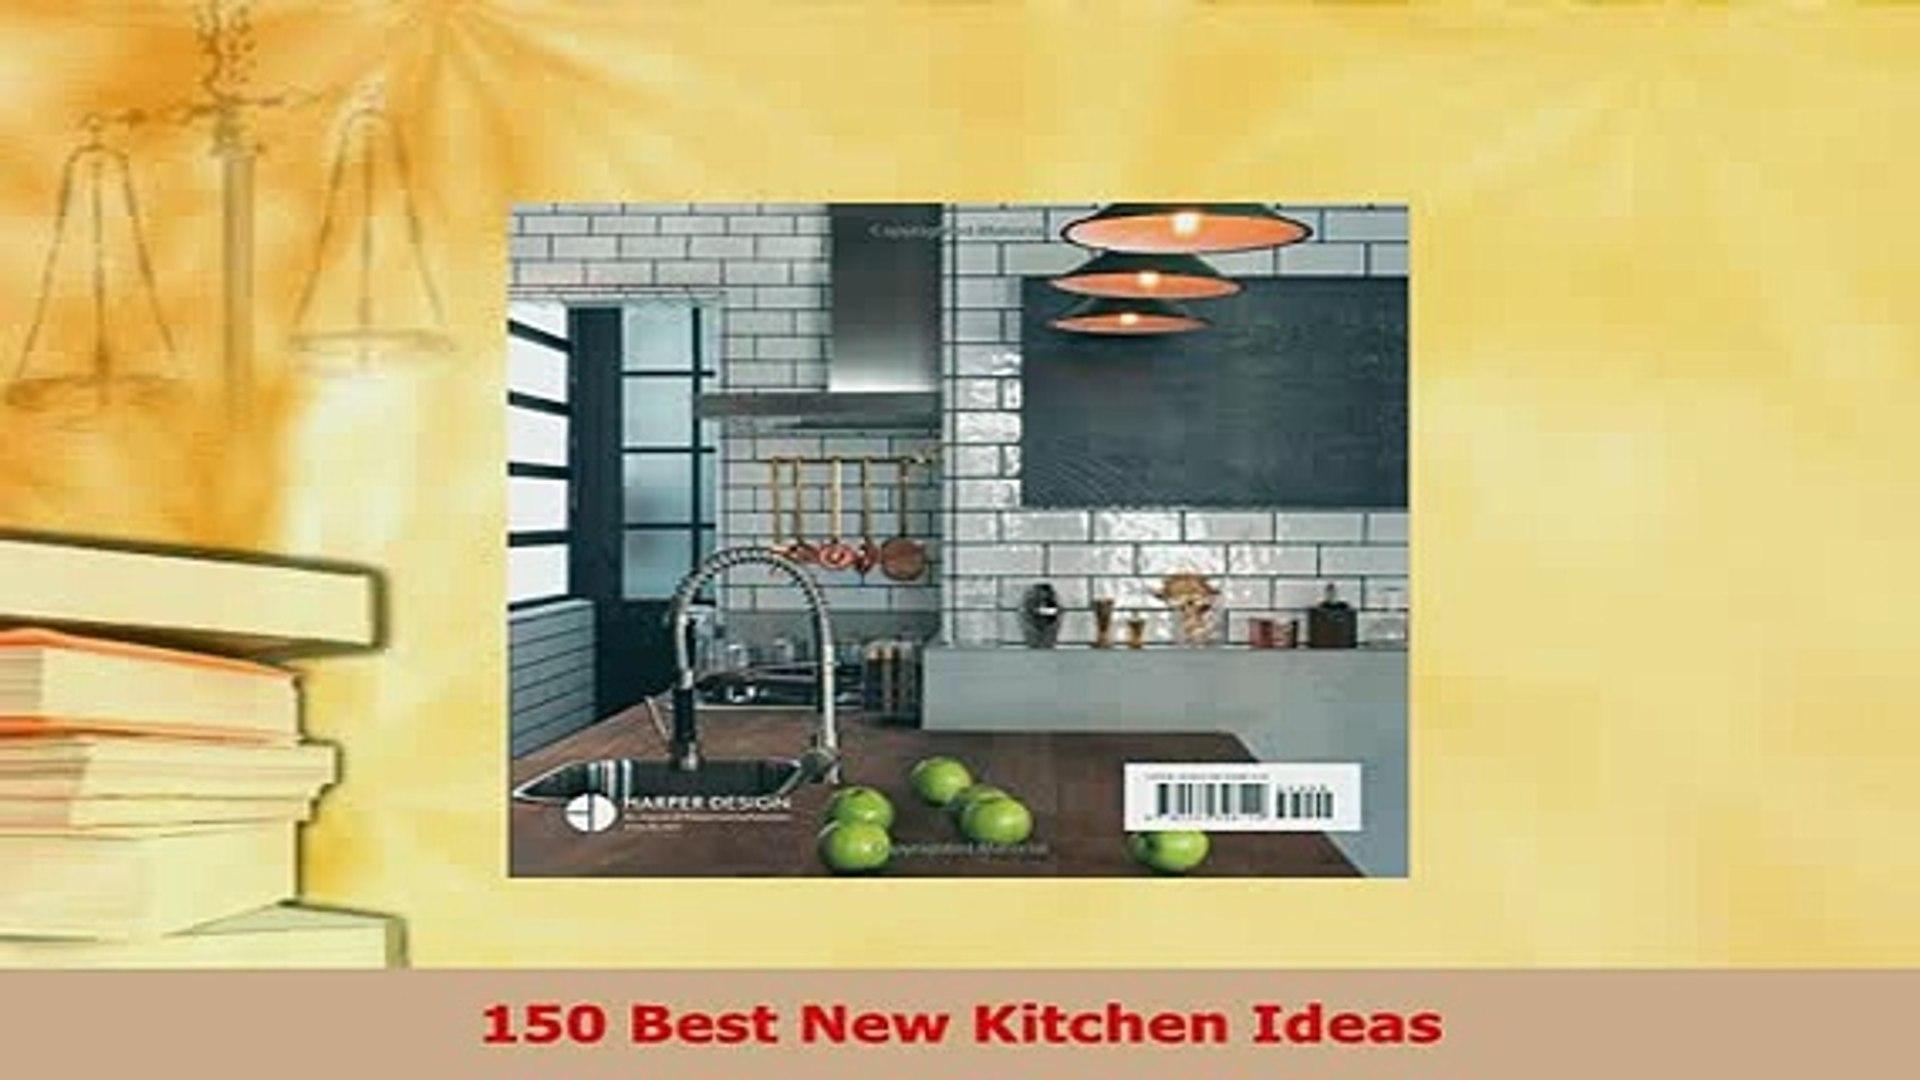 Pdf 150 Best New Kitchen Ideas Read Online Video Dailymotion